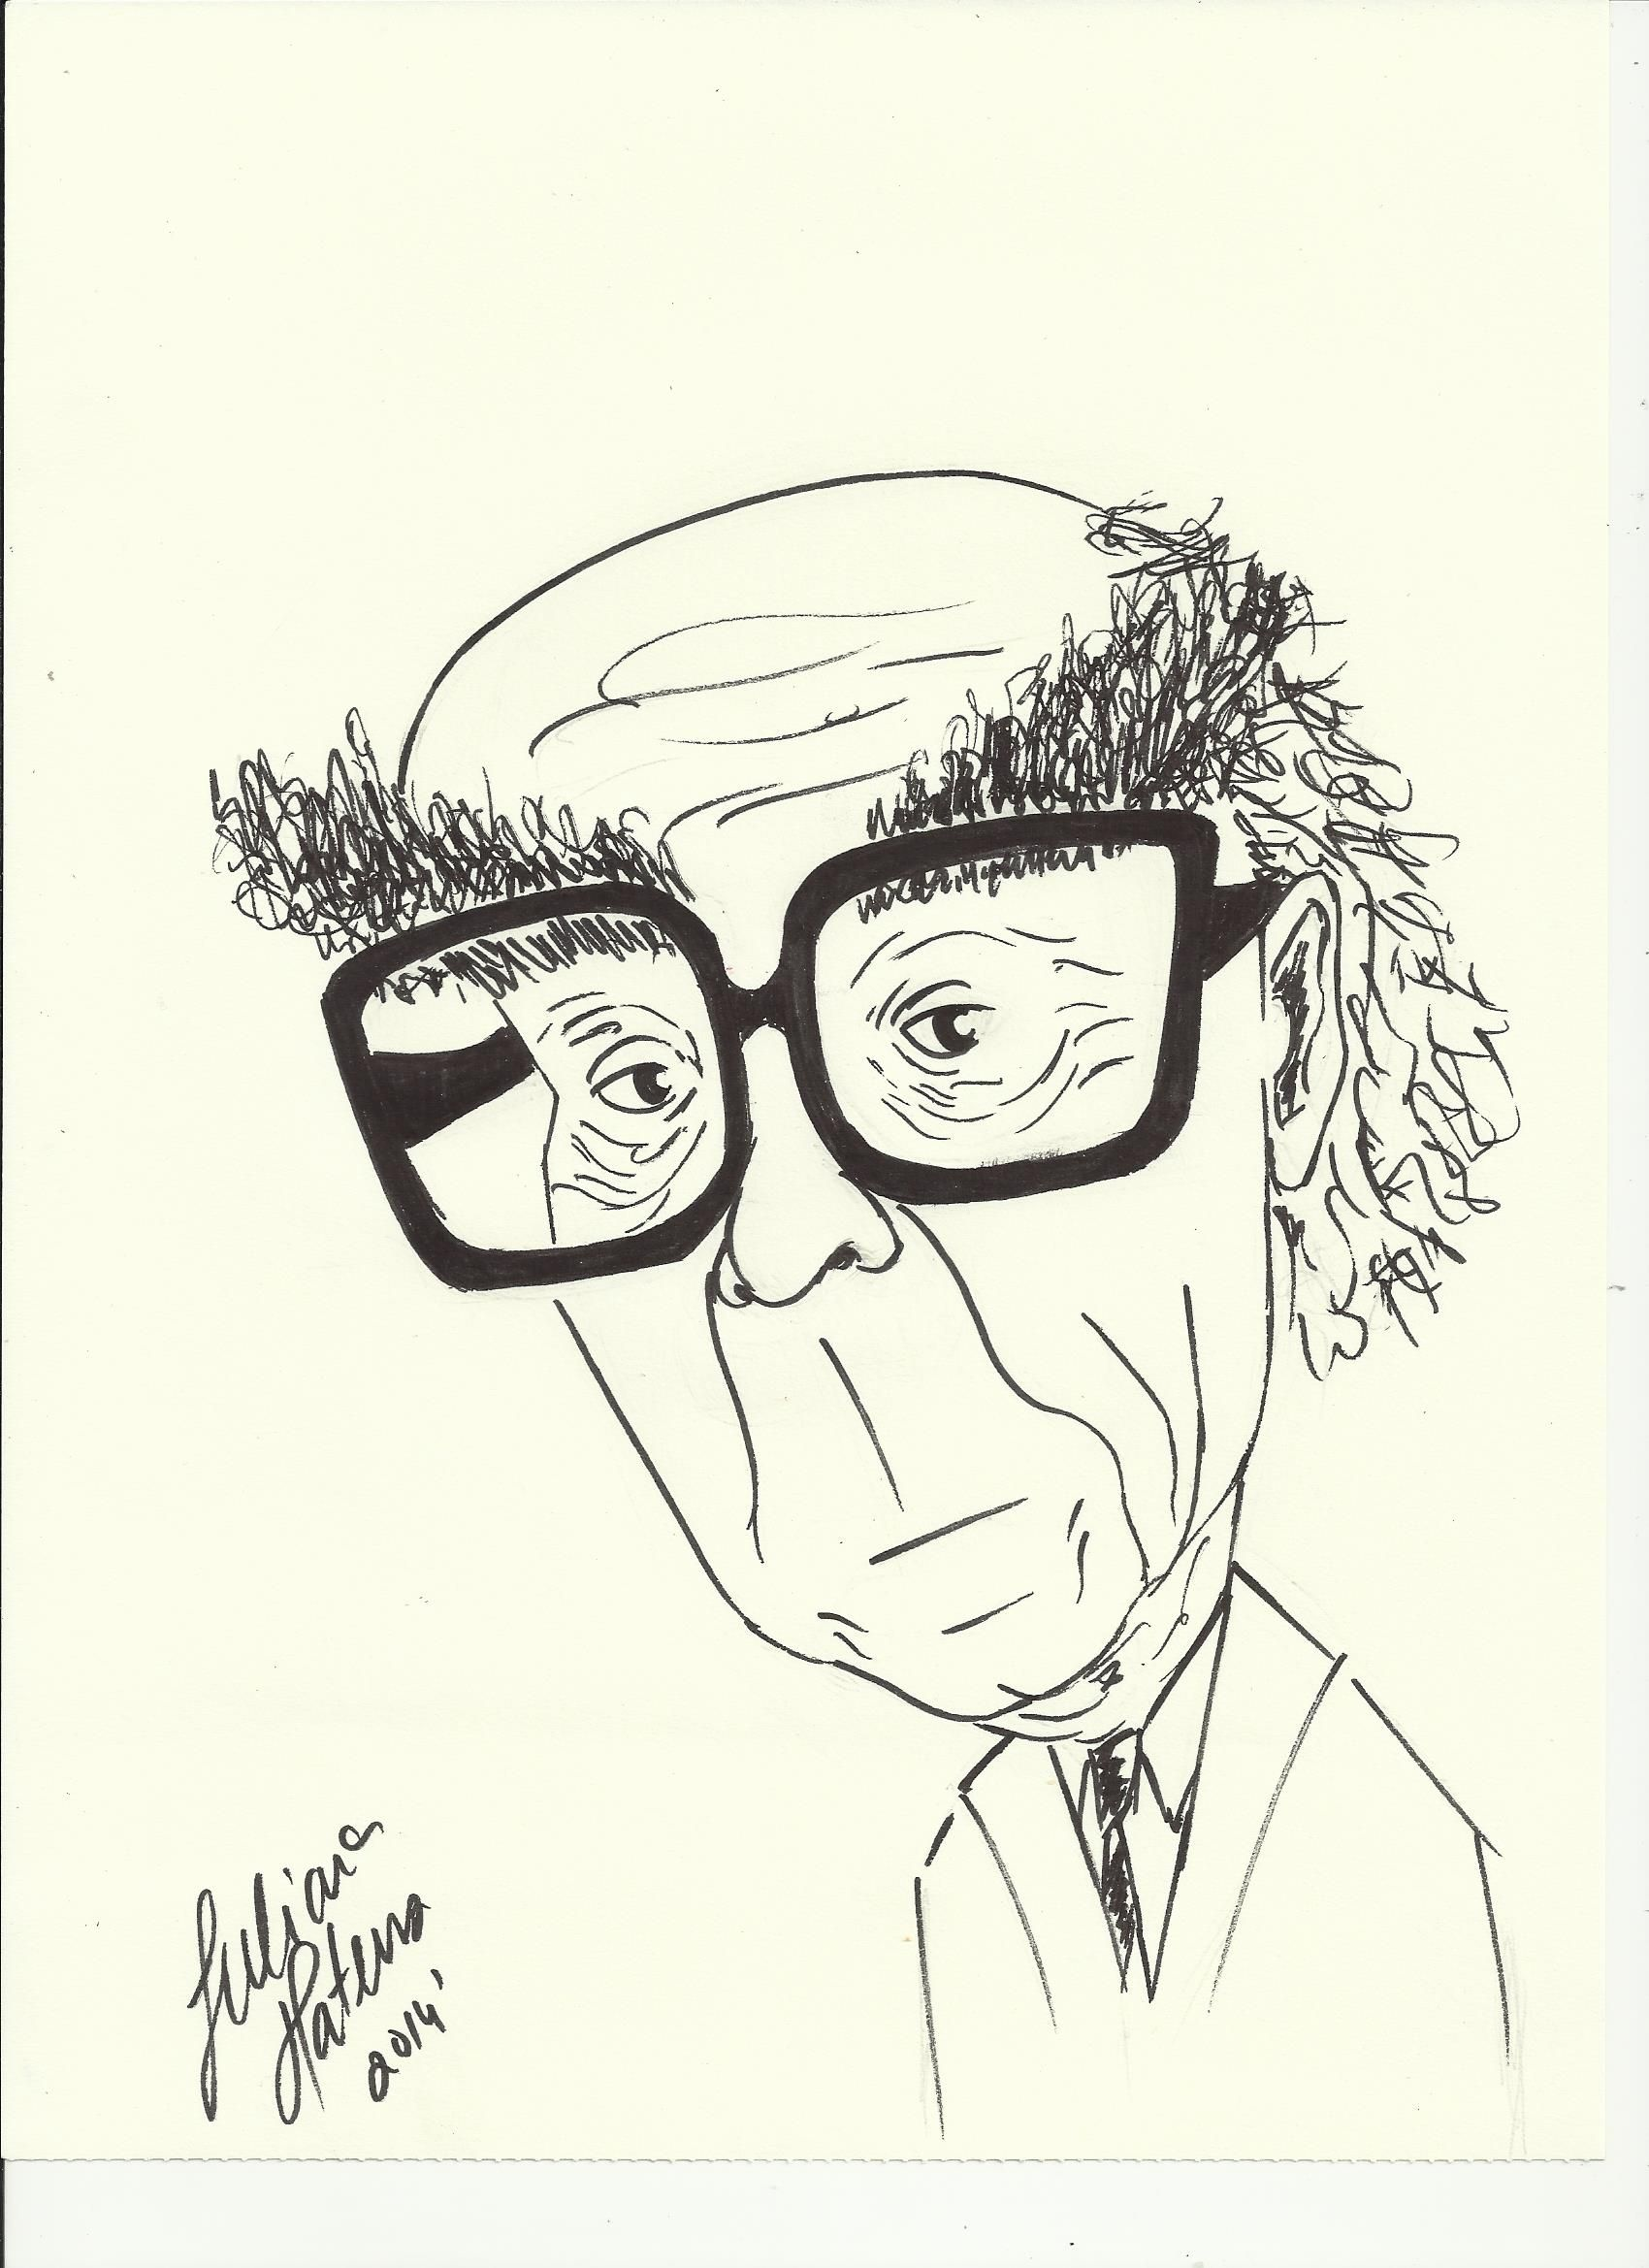 8202f02ed José Saramago', cartoon, JulianaMateus'2014'February | Caricaturas ...